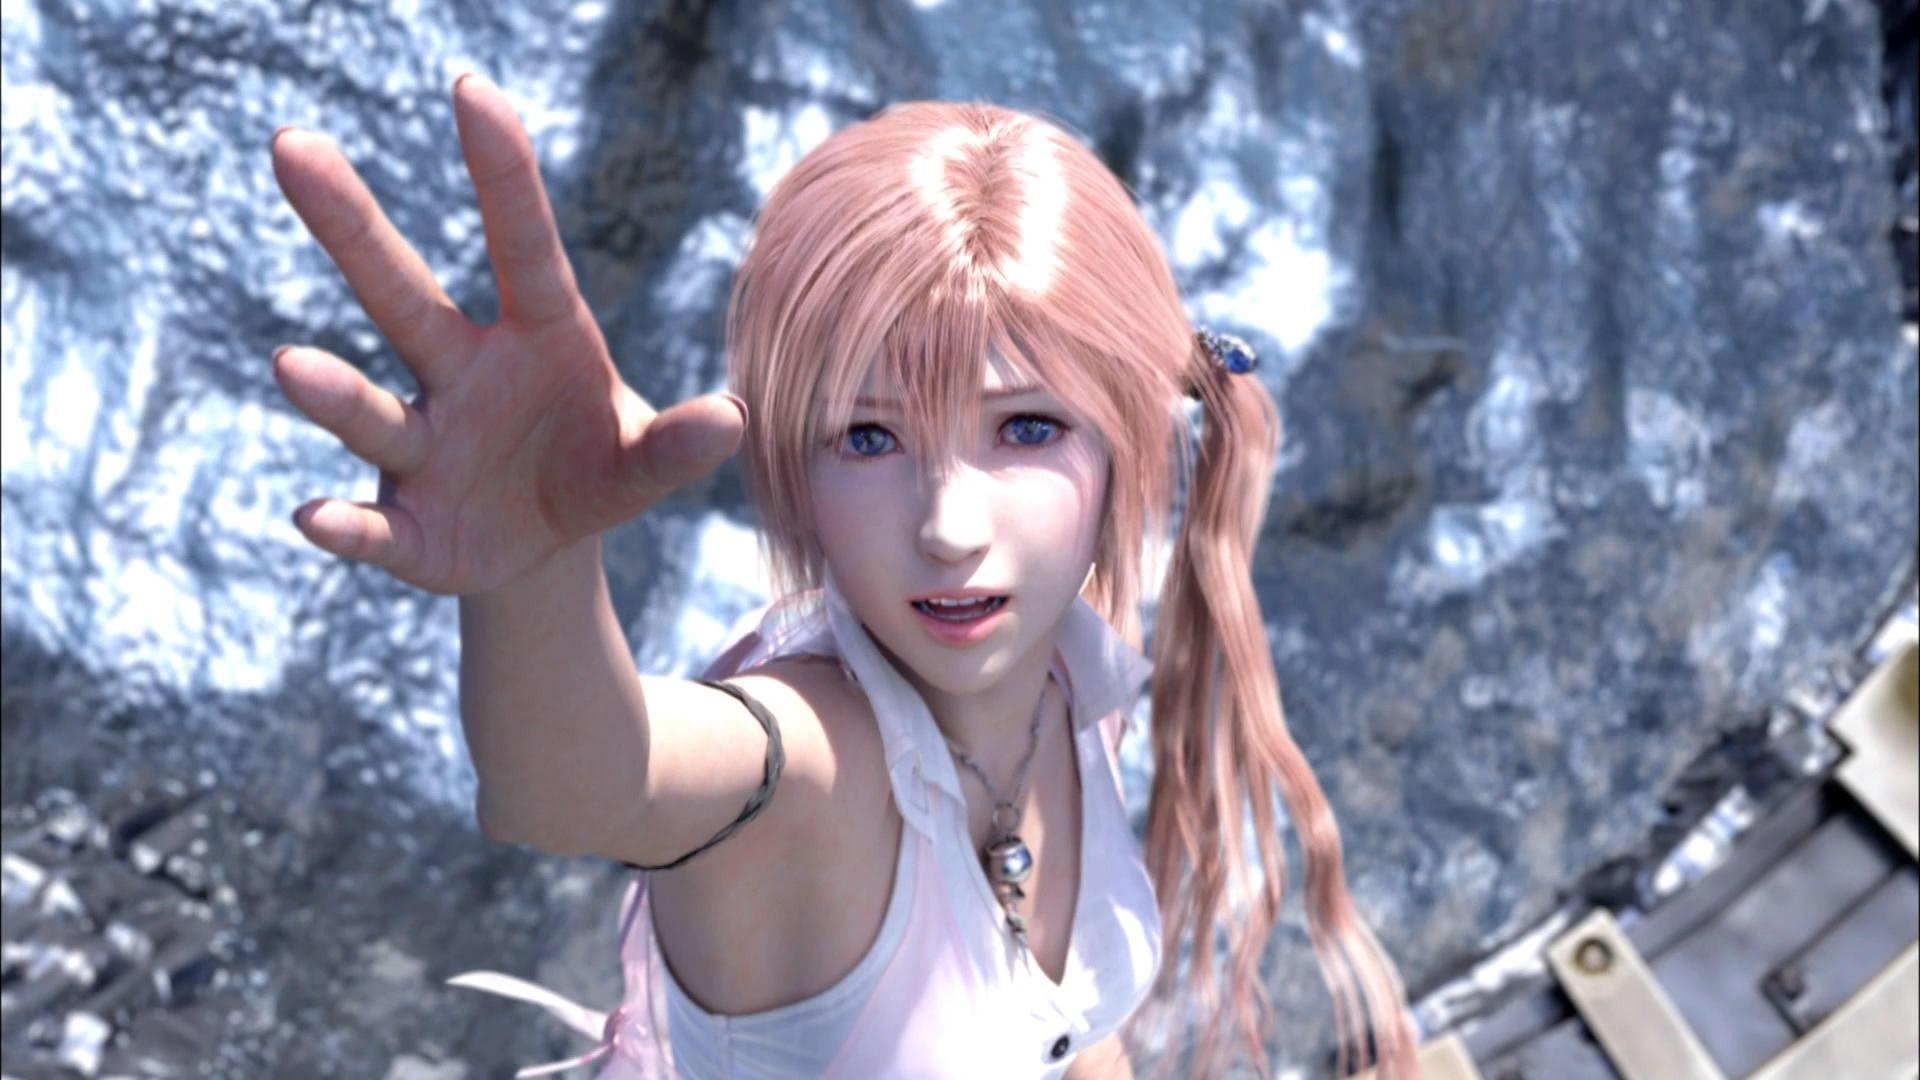 Final Fantasy XIII HD Wallpapers Backgrounds Wallpaper · LightningFinals